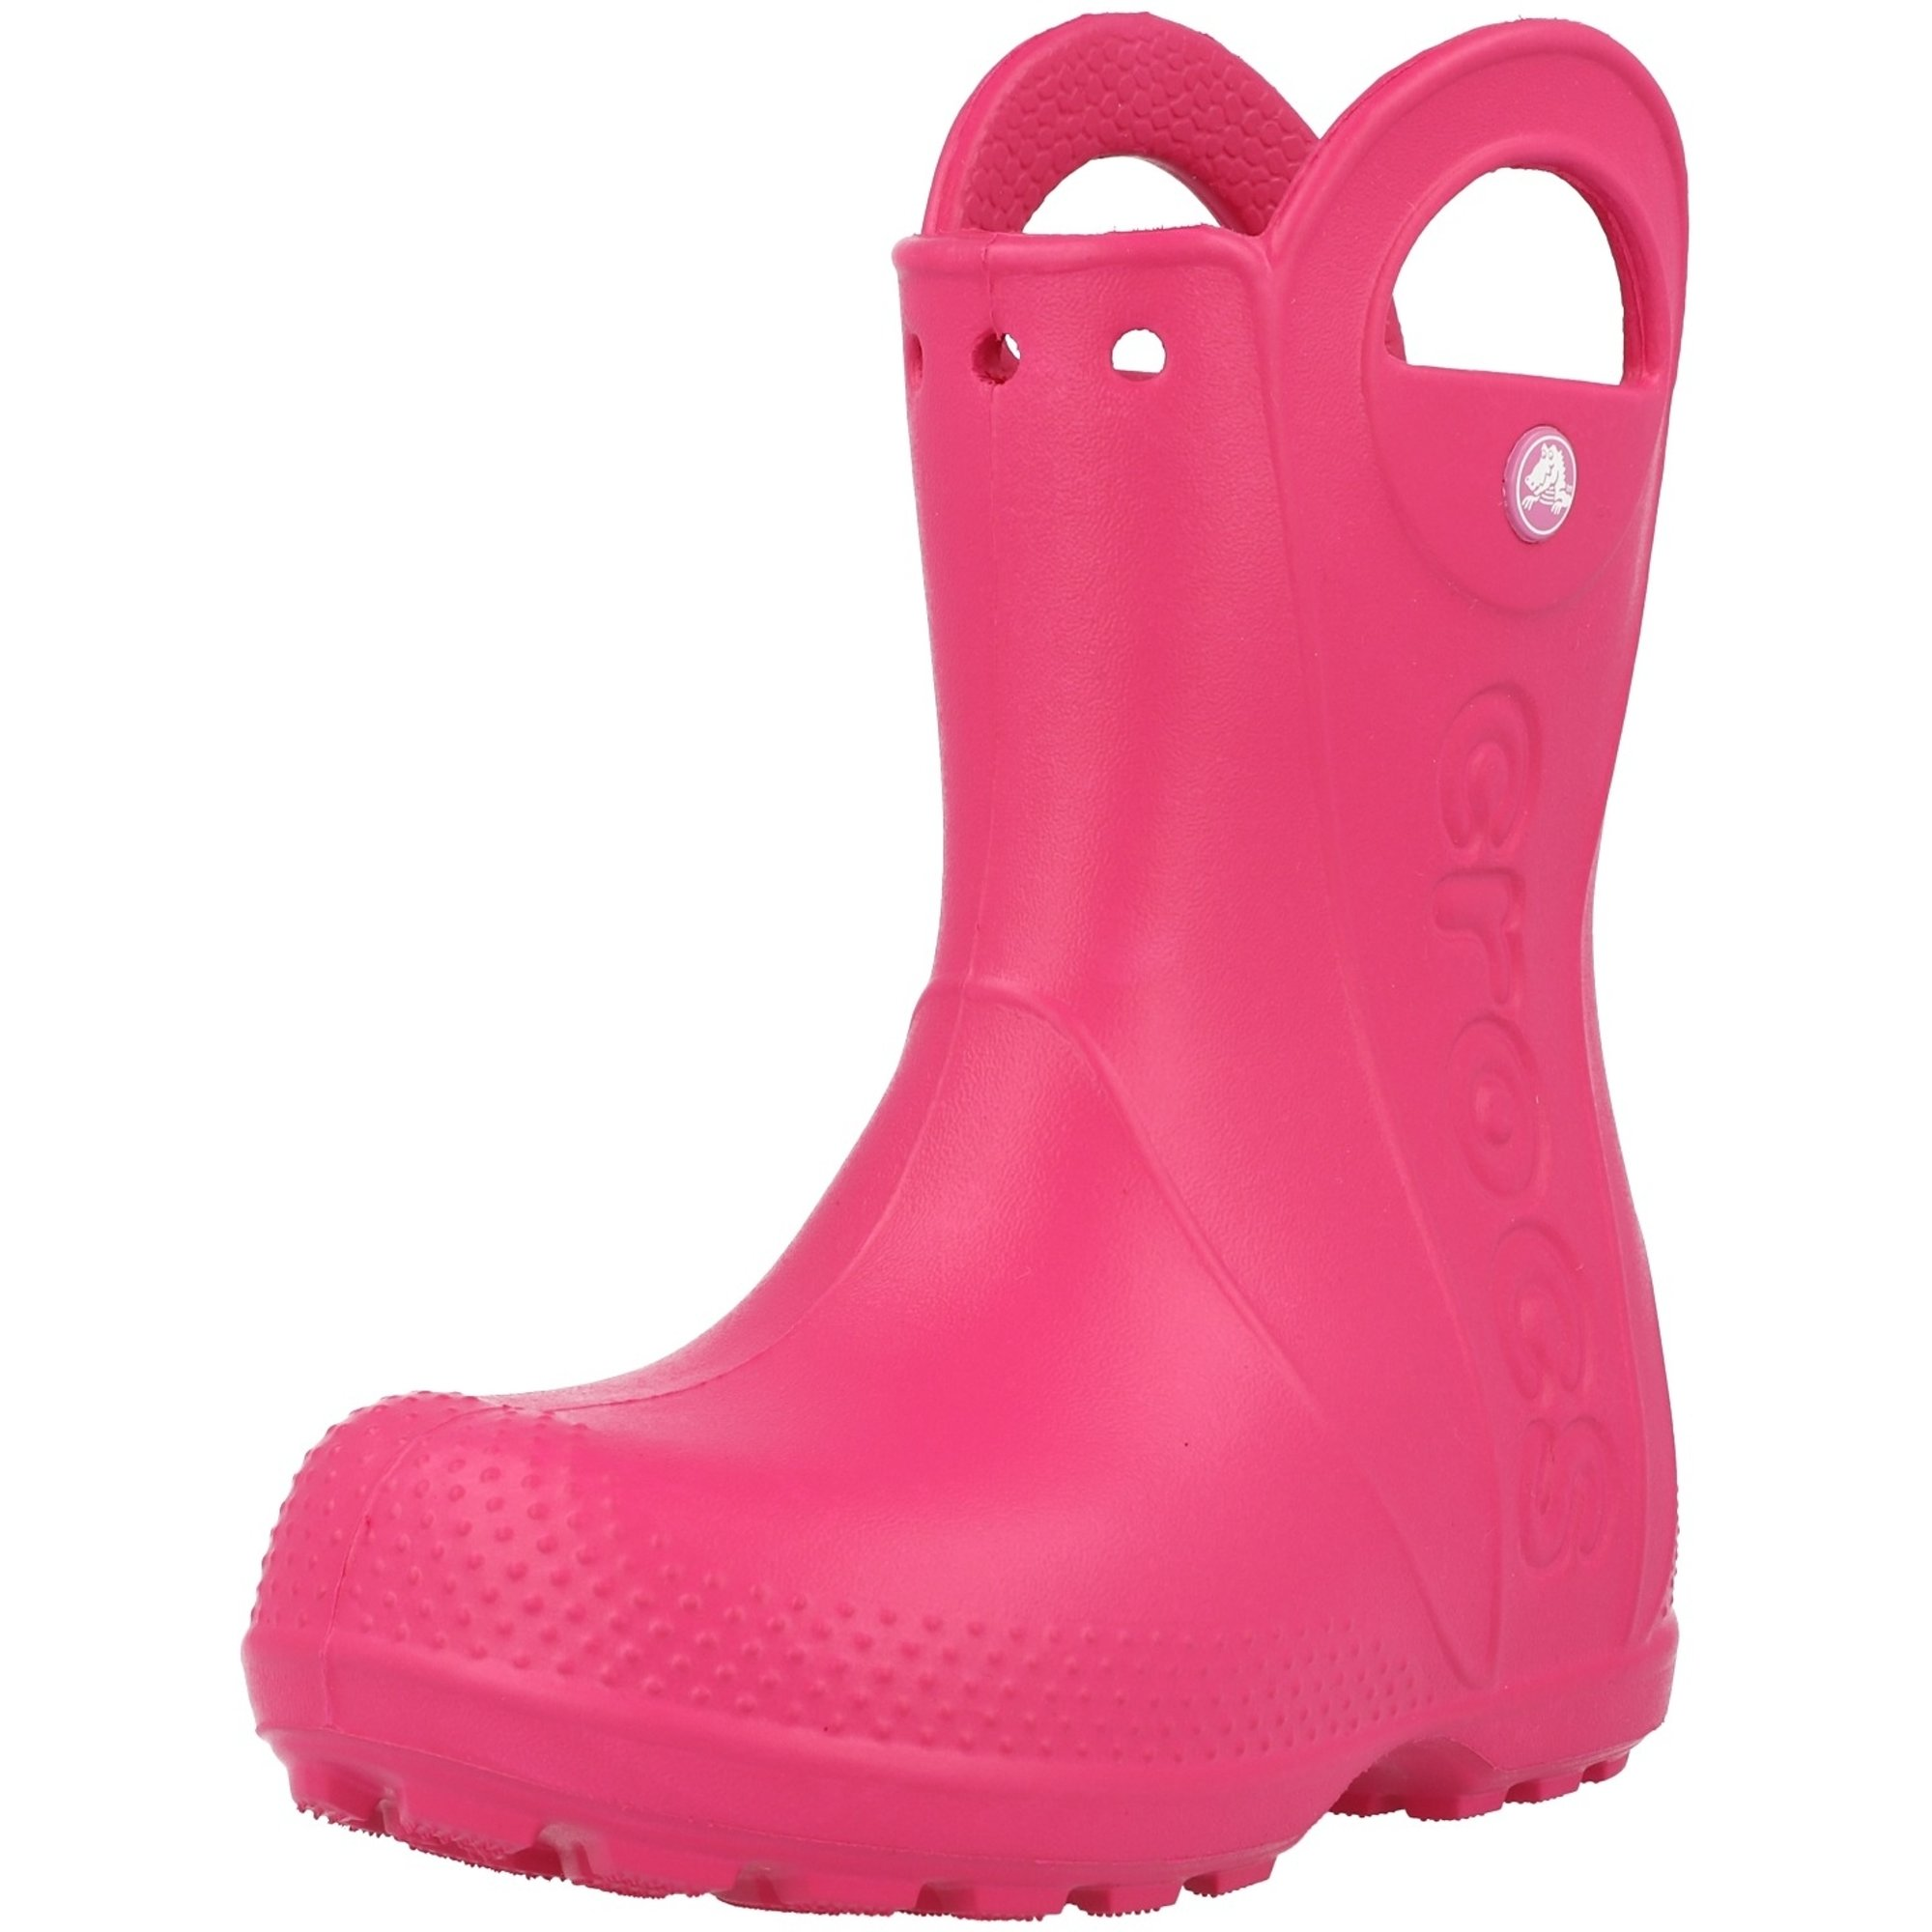 Crocs Kids Handle It Rain Boot Candy Pink Croslite